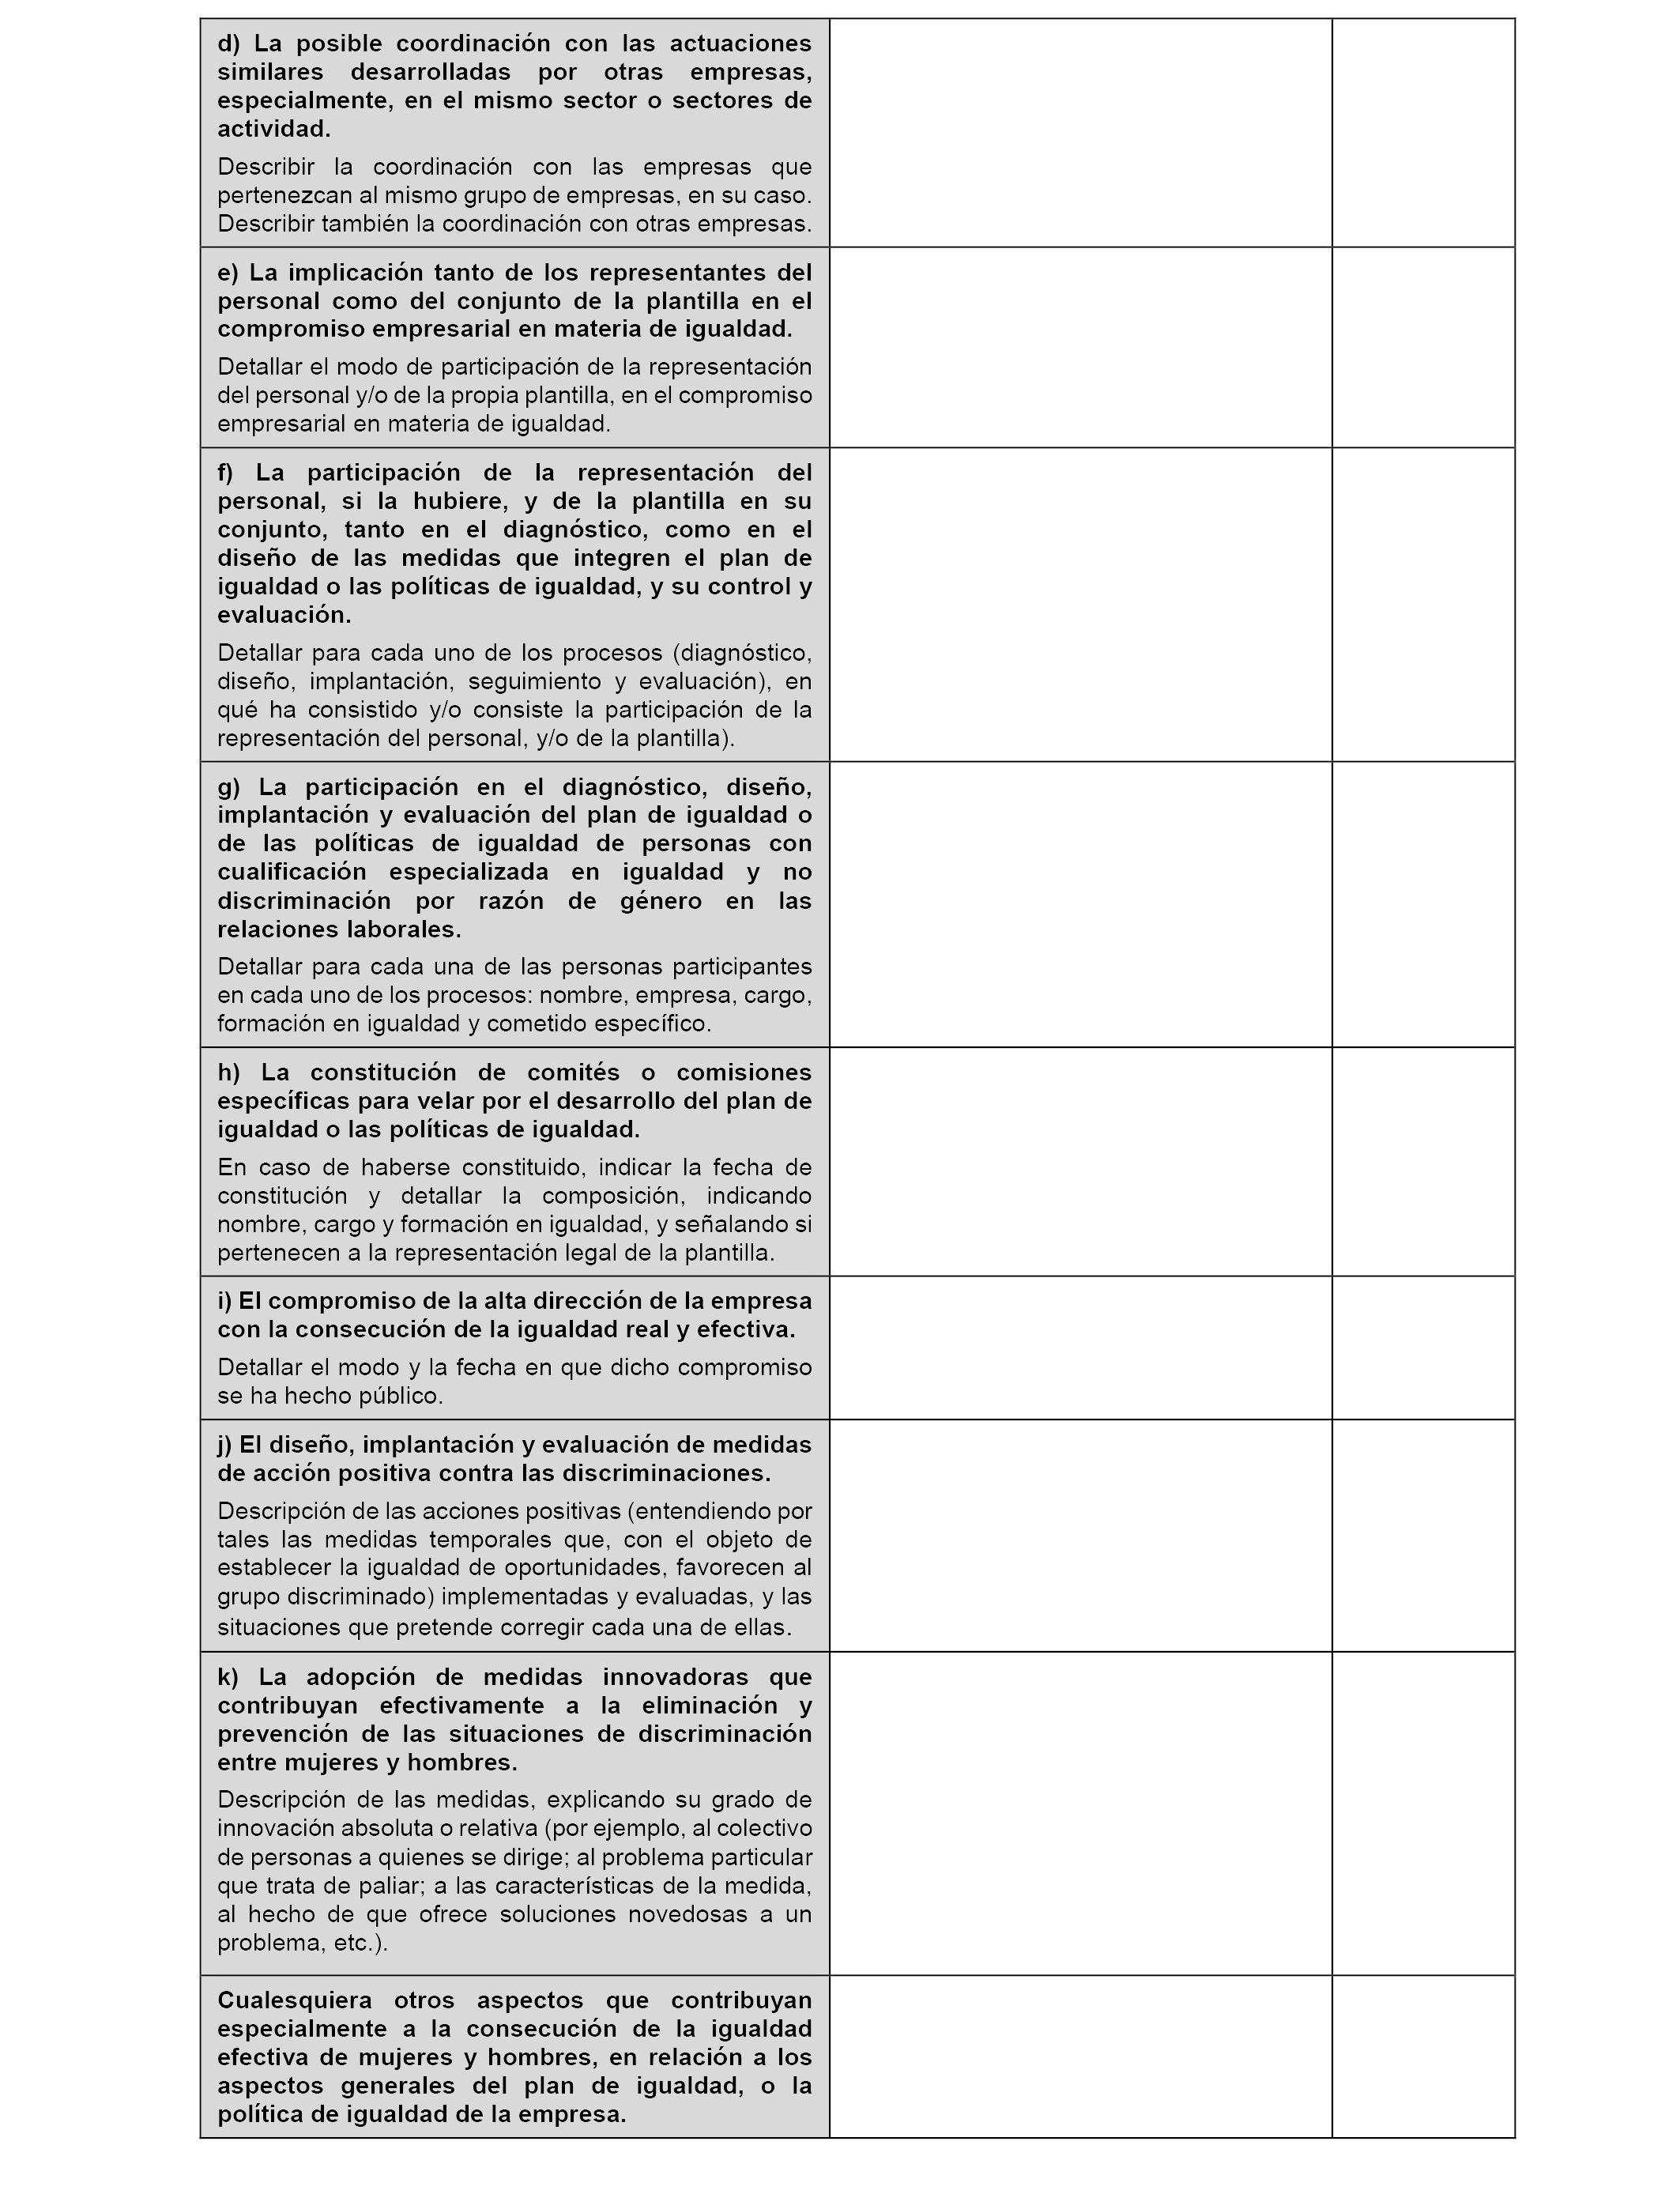 BOE.es - Documento BOE-A-2018-1906